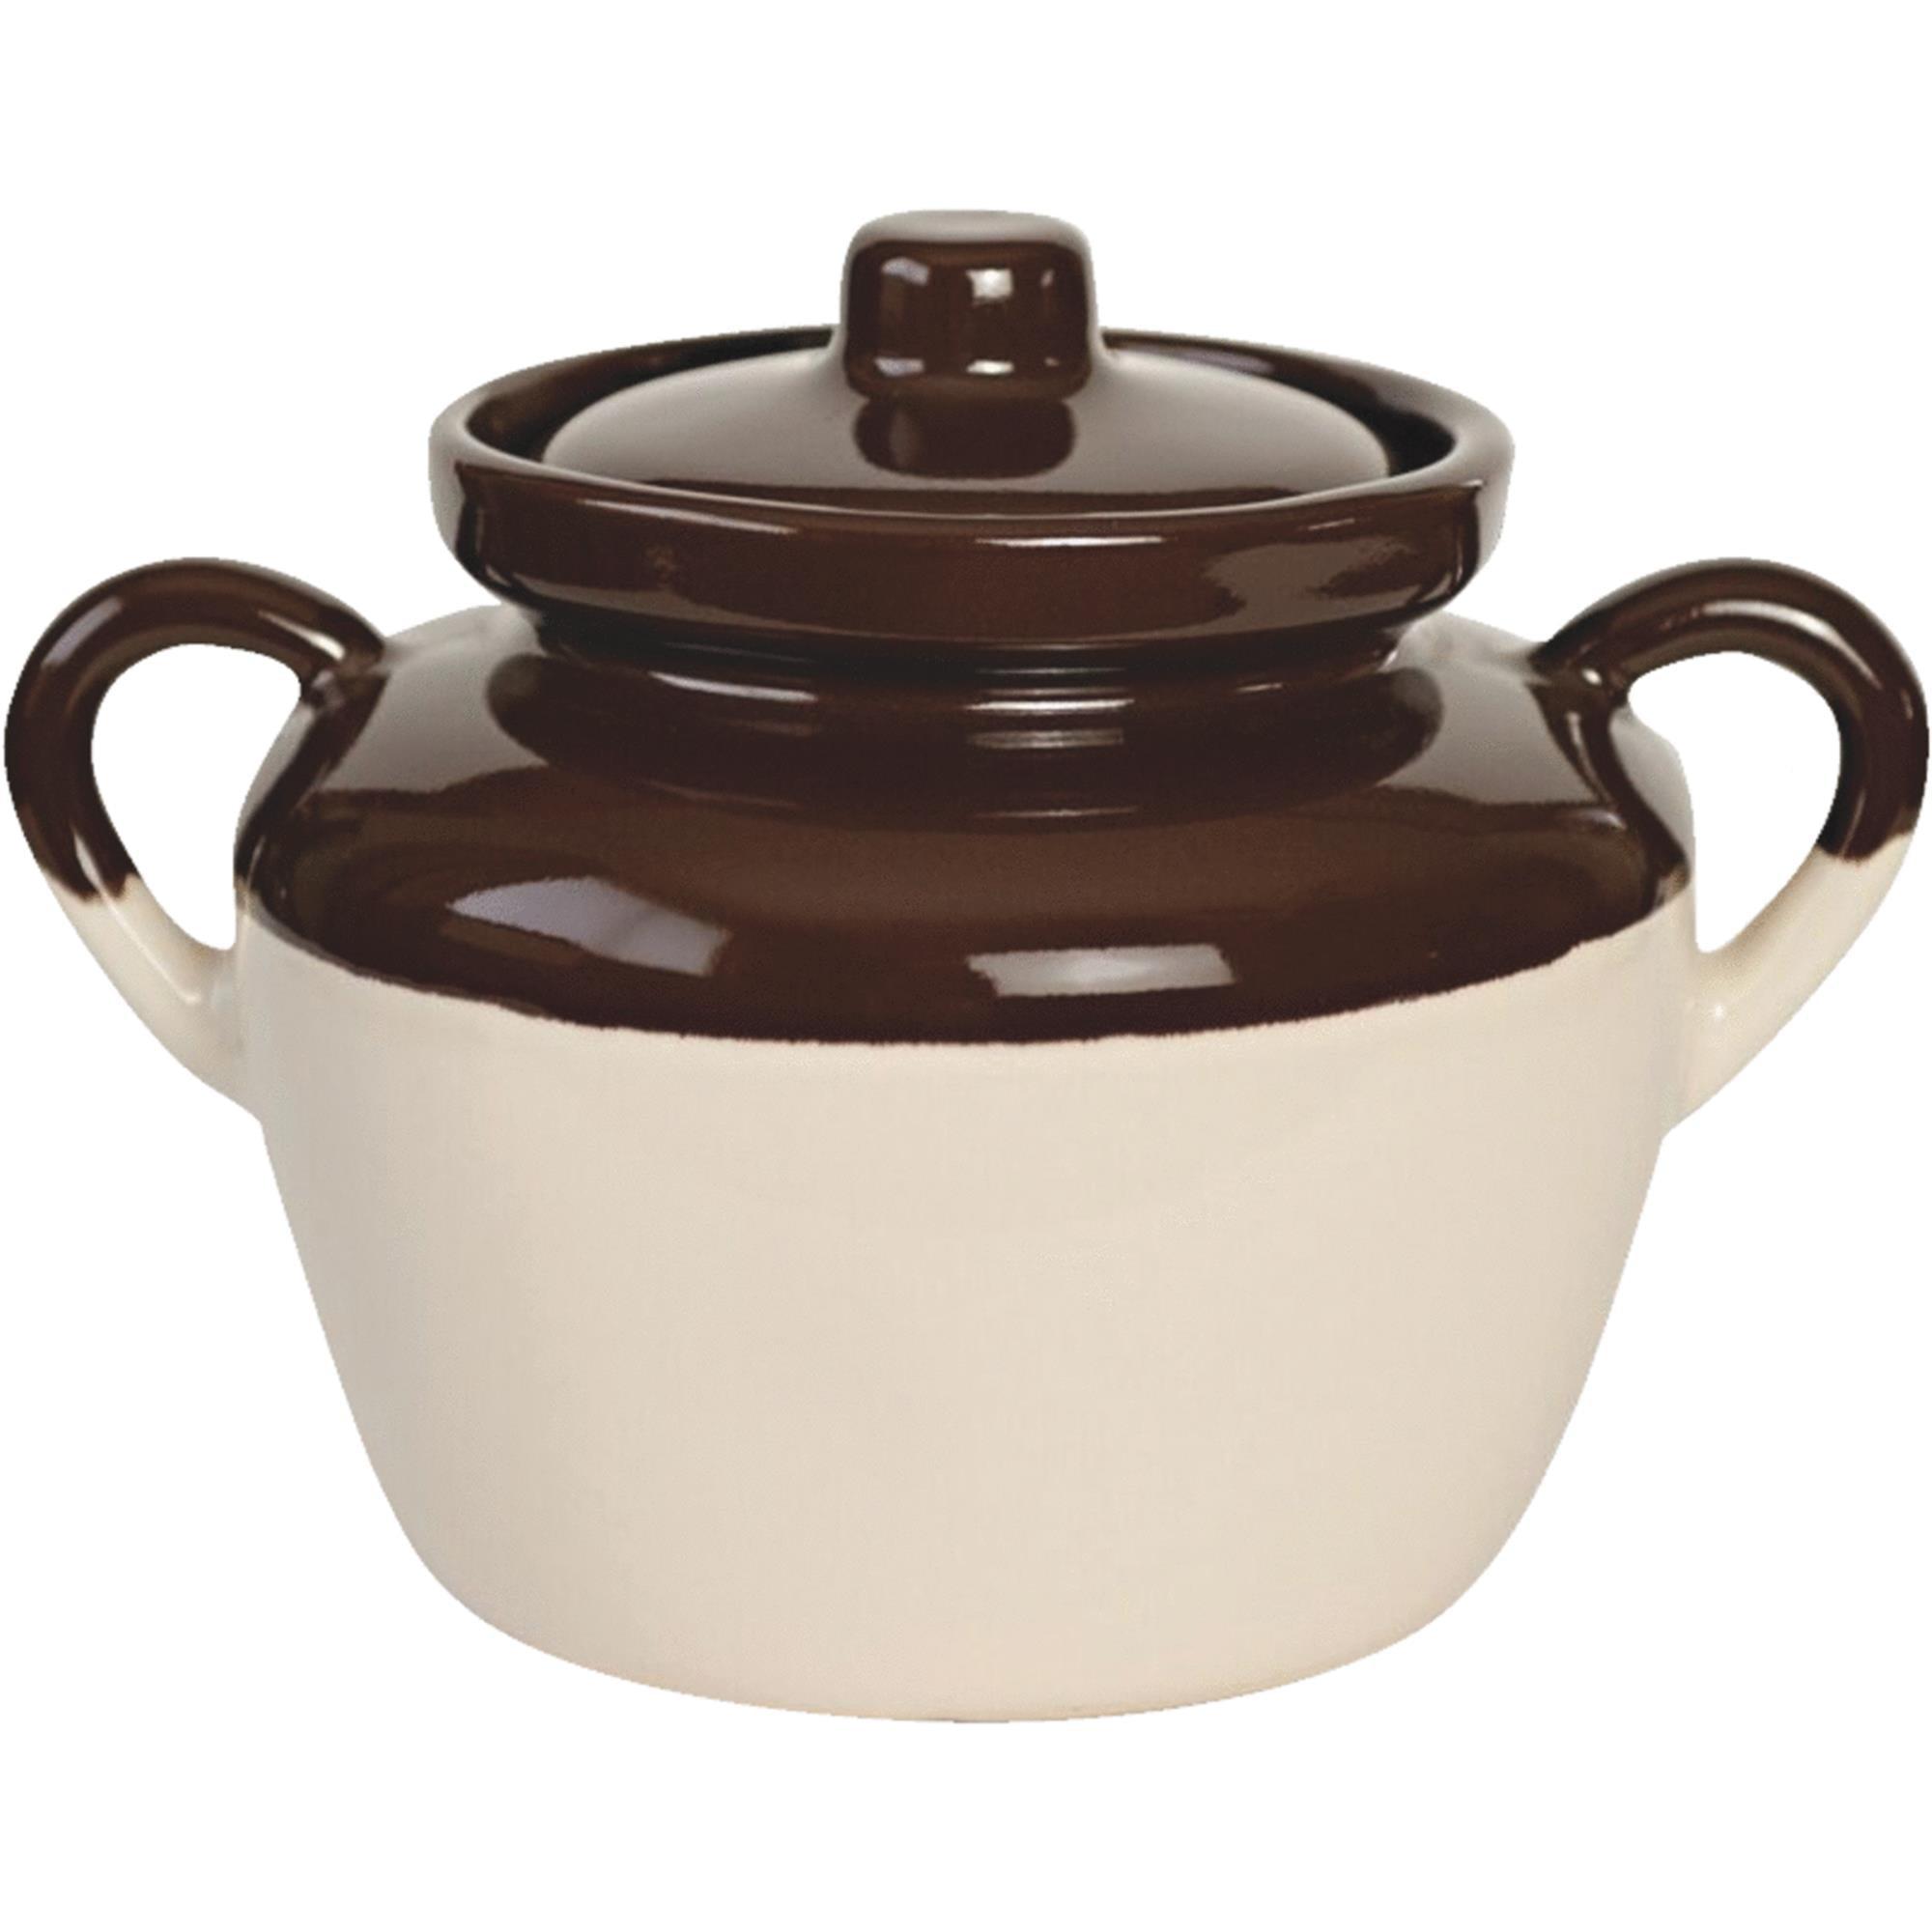 Stoneware 2 Quart Bean Pot Casserole Dish